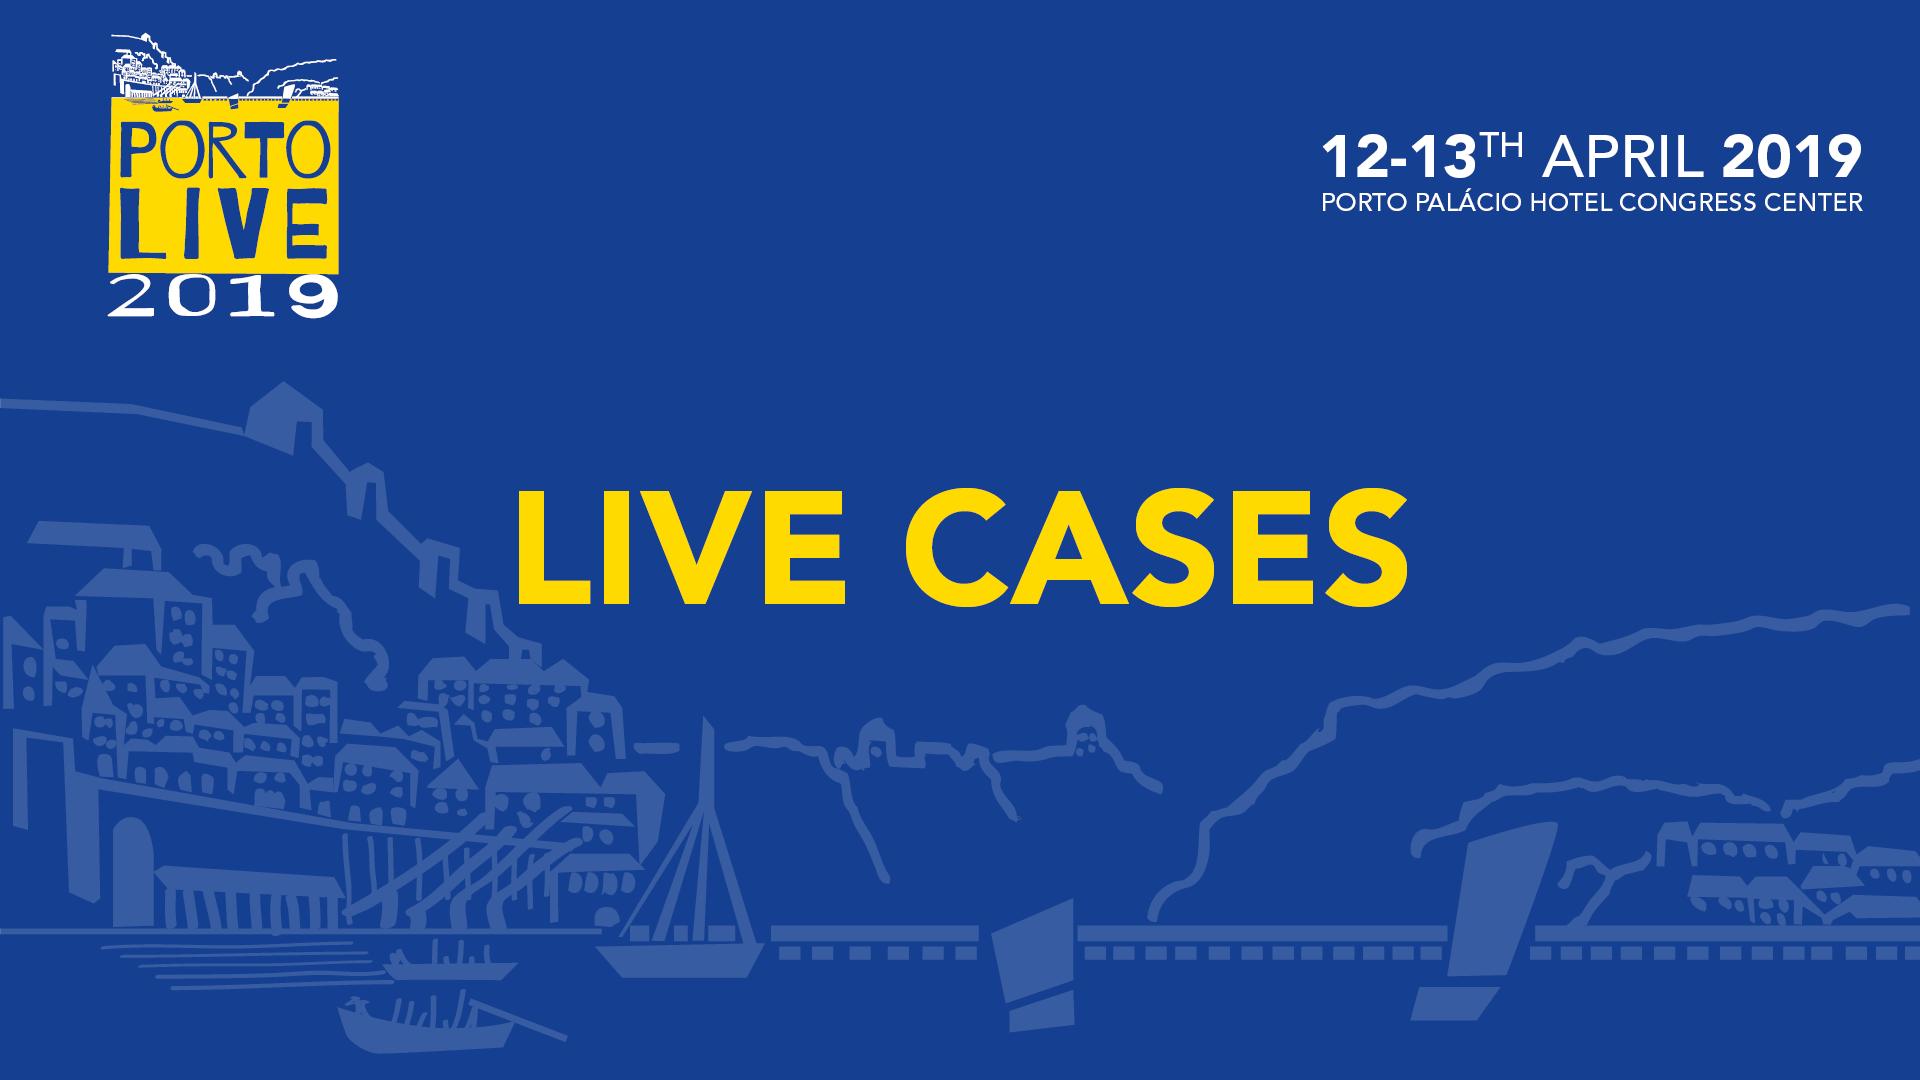 Live Case #1: In-vitro Fenestration Assisted TEVAR